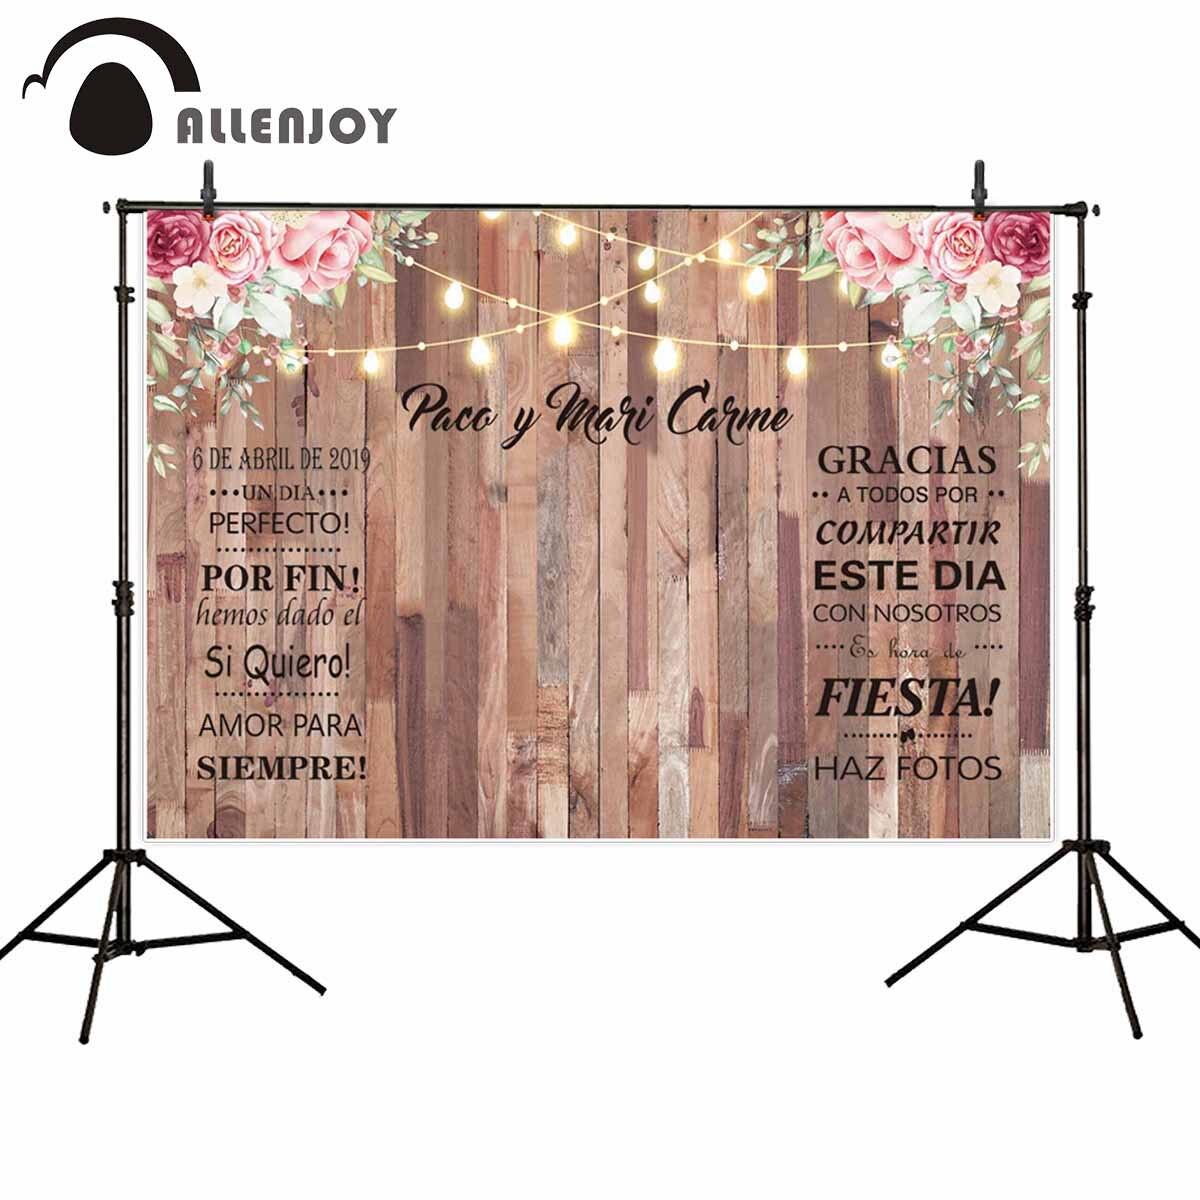 Allenjoy-FONDO PARA FOTOS DE boda, poste de luz de madera, flor brillante,...